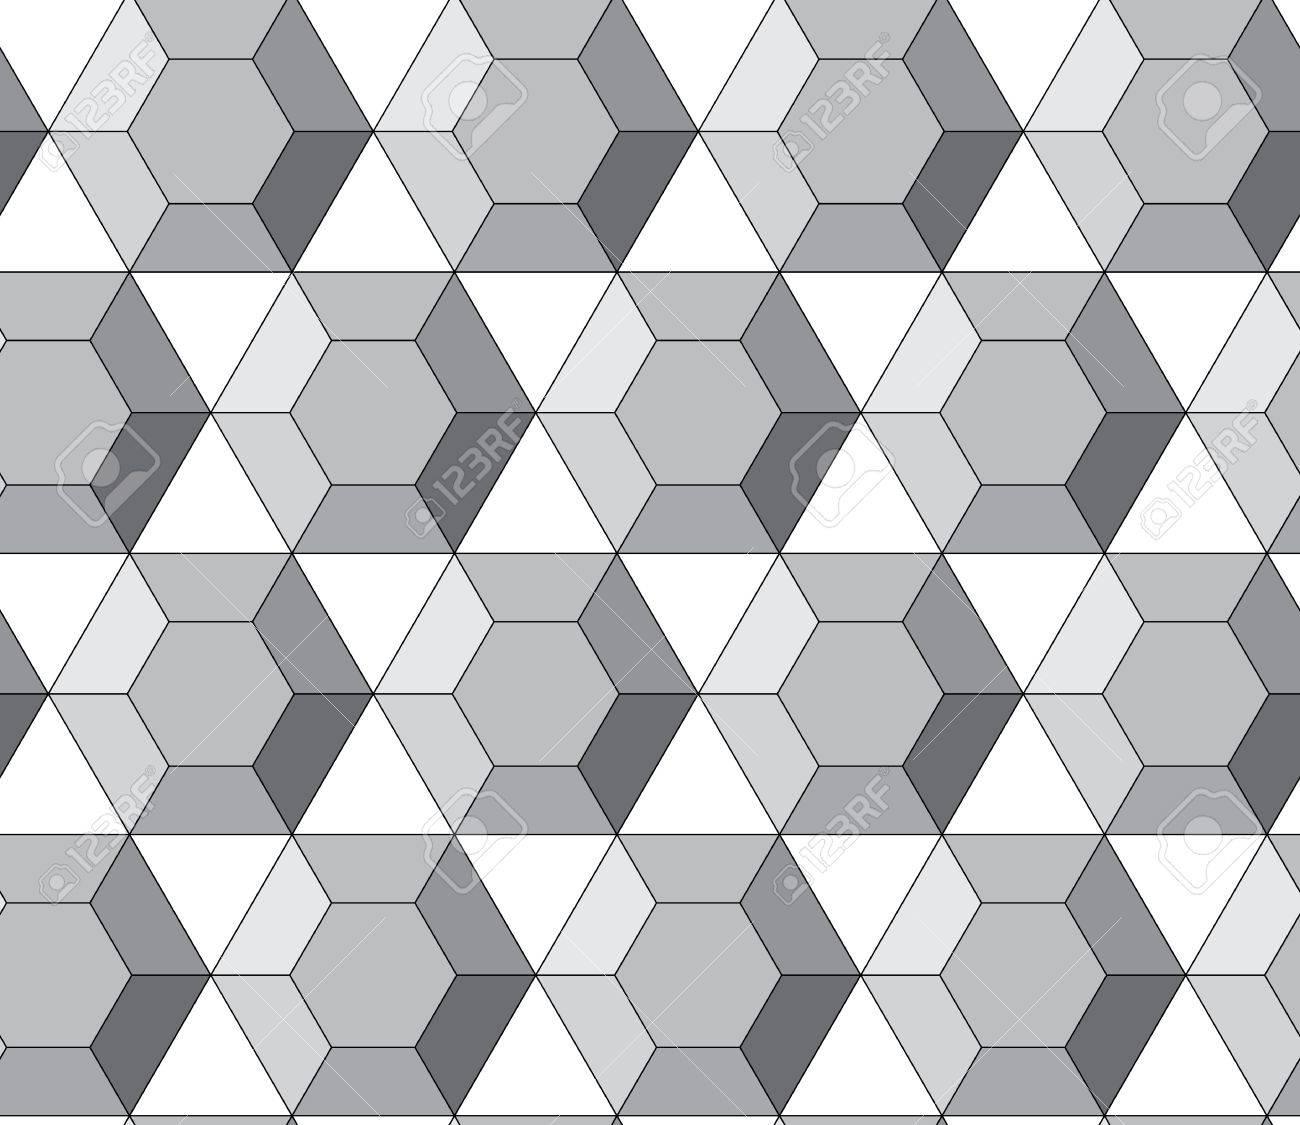 Simple geometric hexagons resemble the diamonds Stock Vector - 14766717